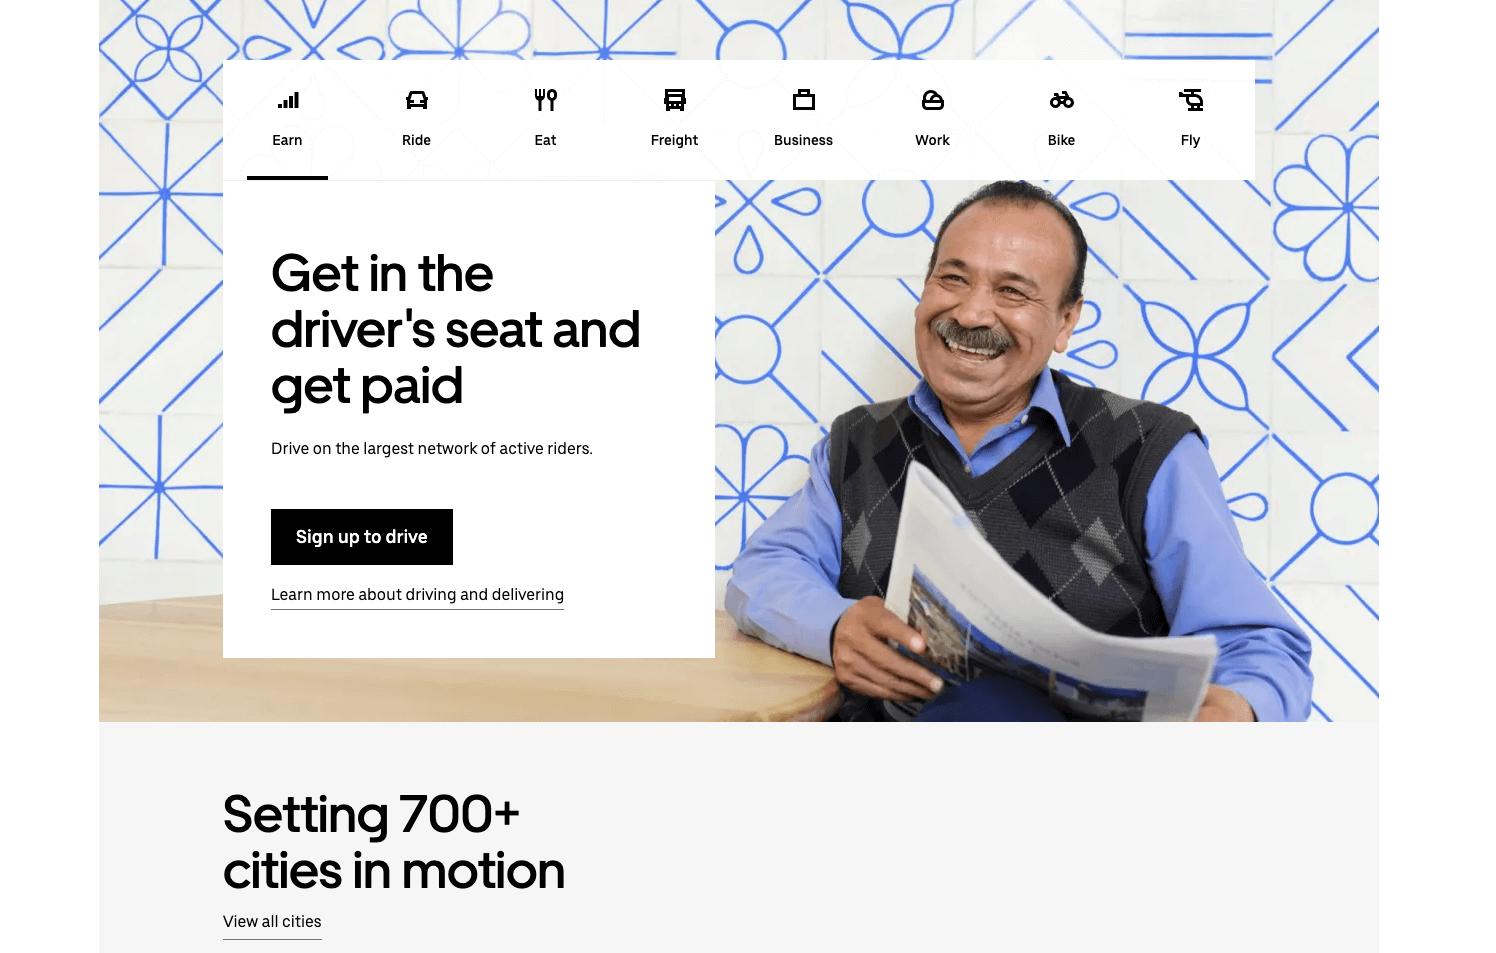 uber topography design